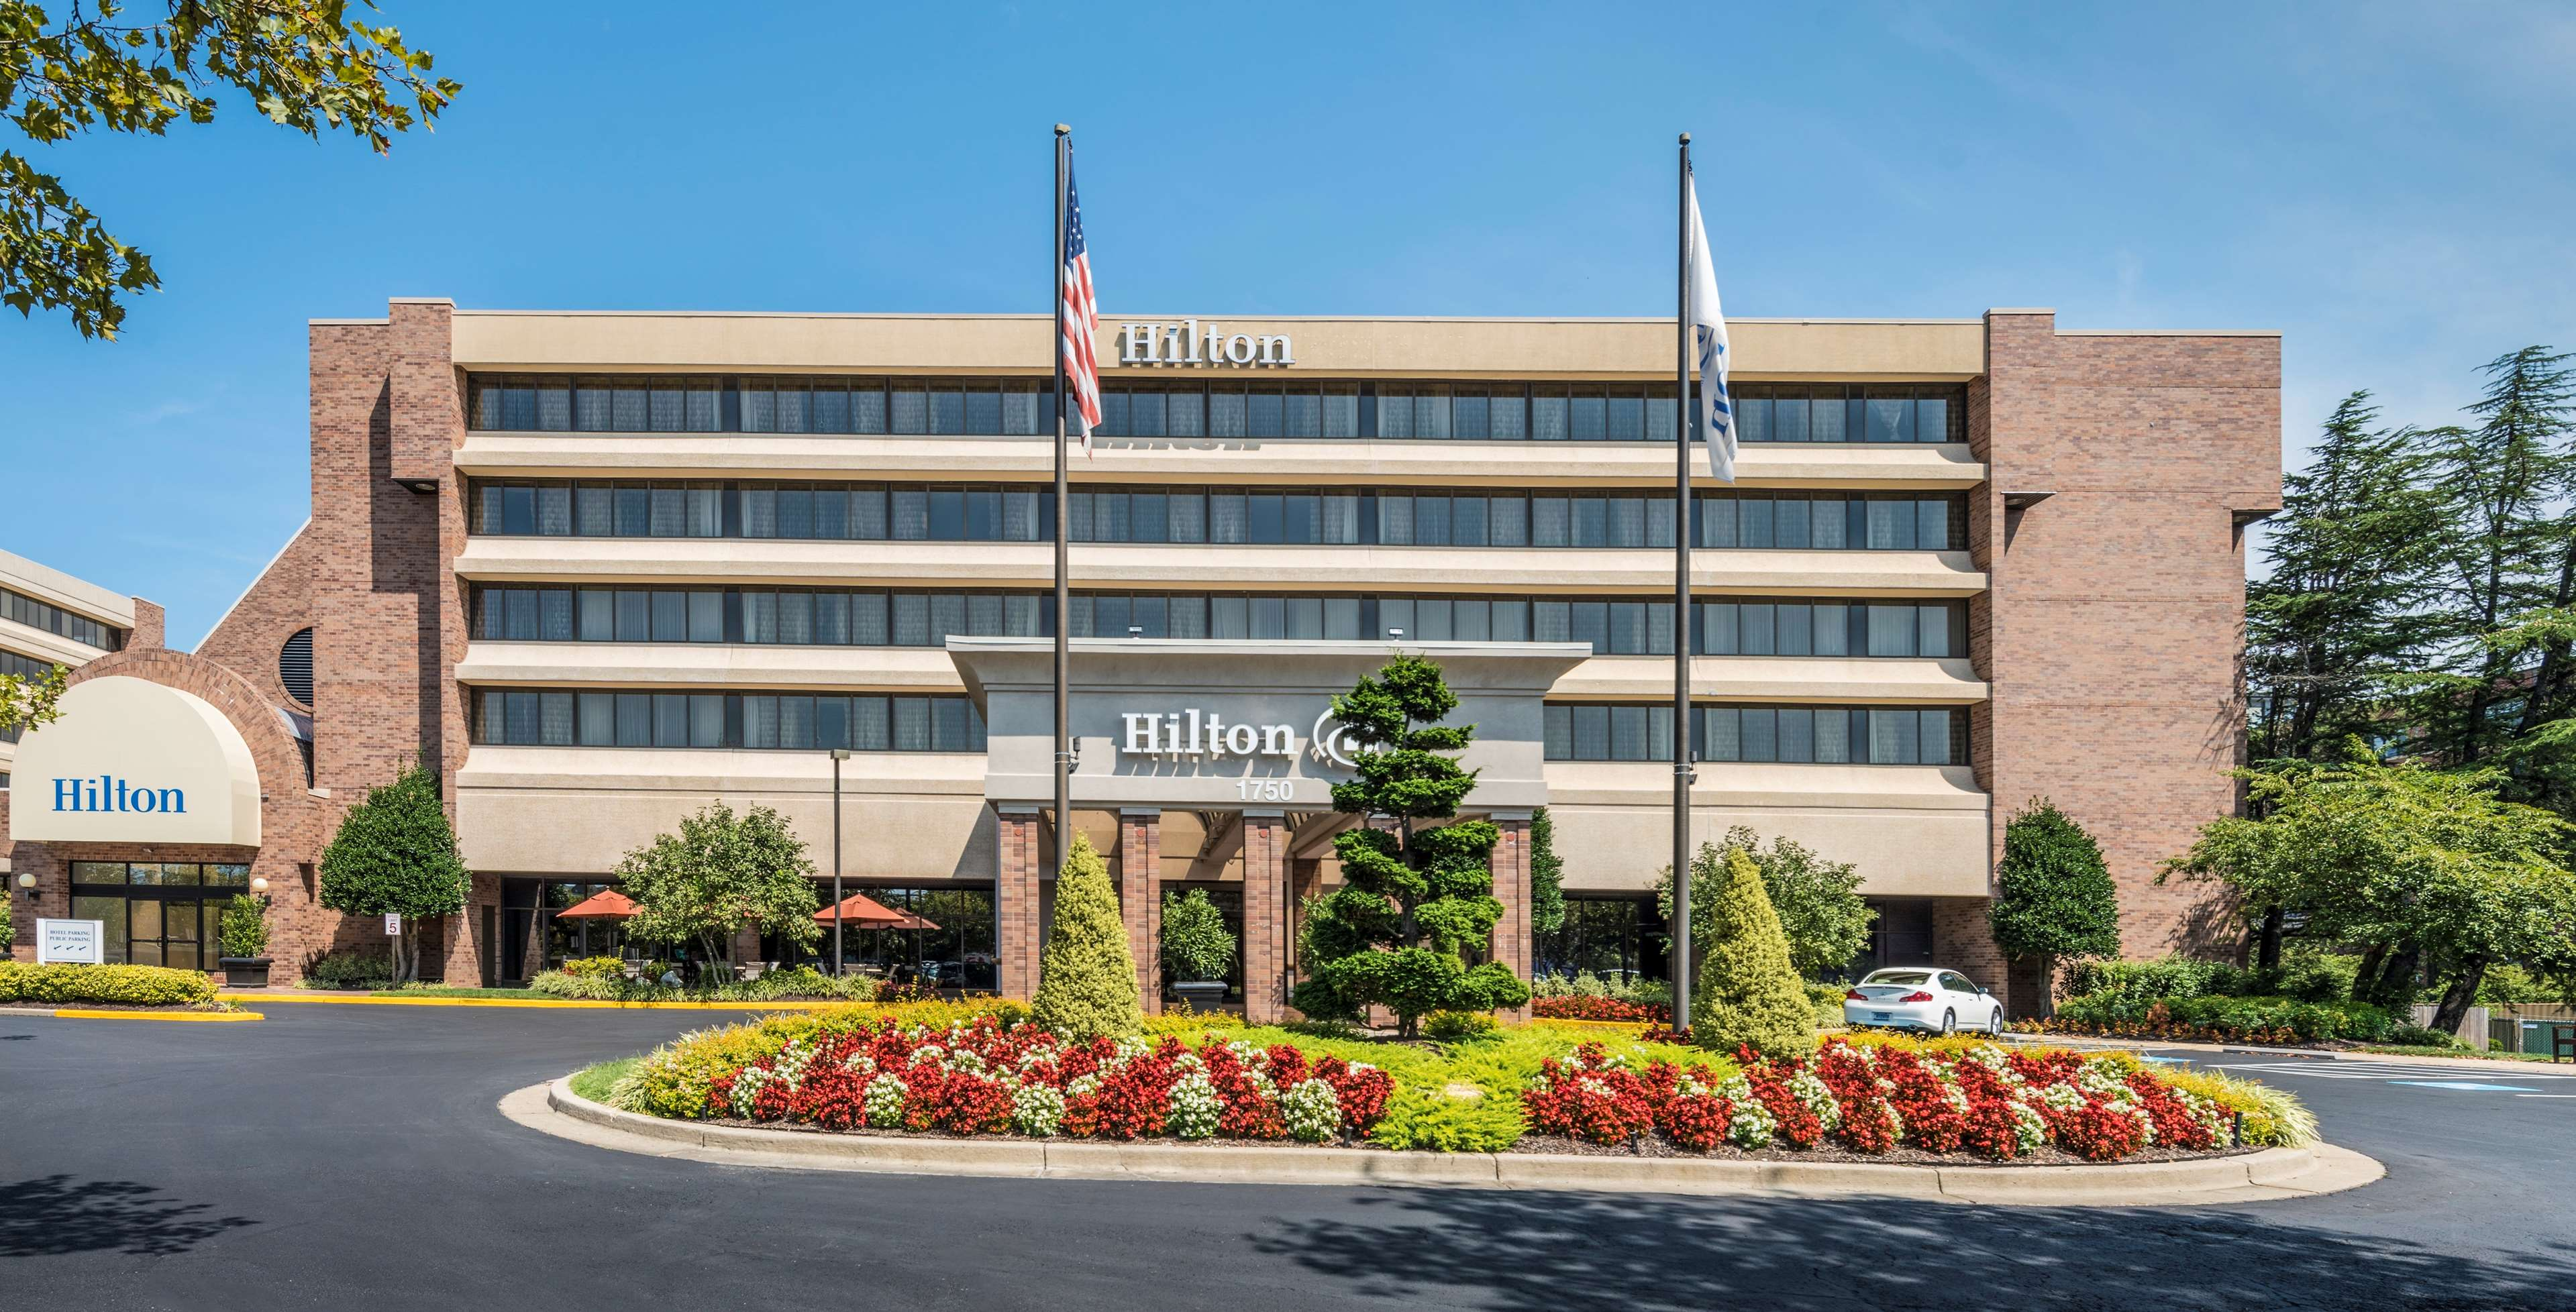 Hilton Washington DC/Rockville Hotel & Executive Meeting Ctr image 1